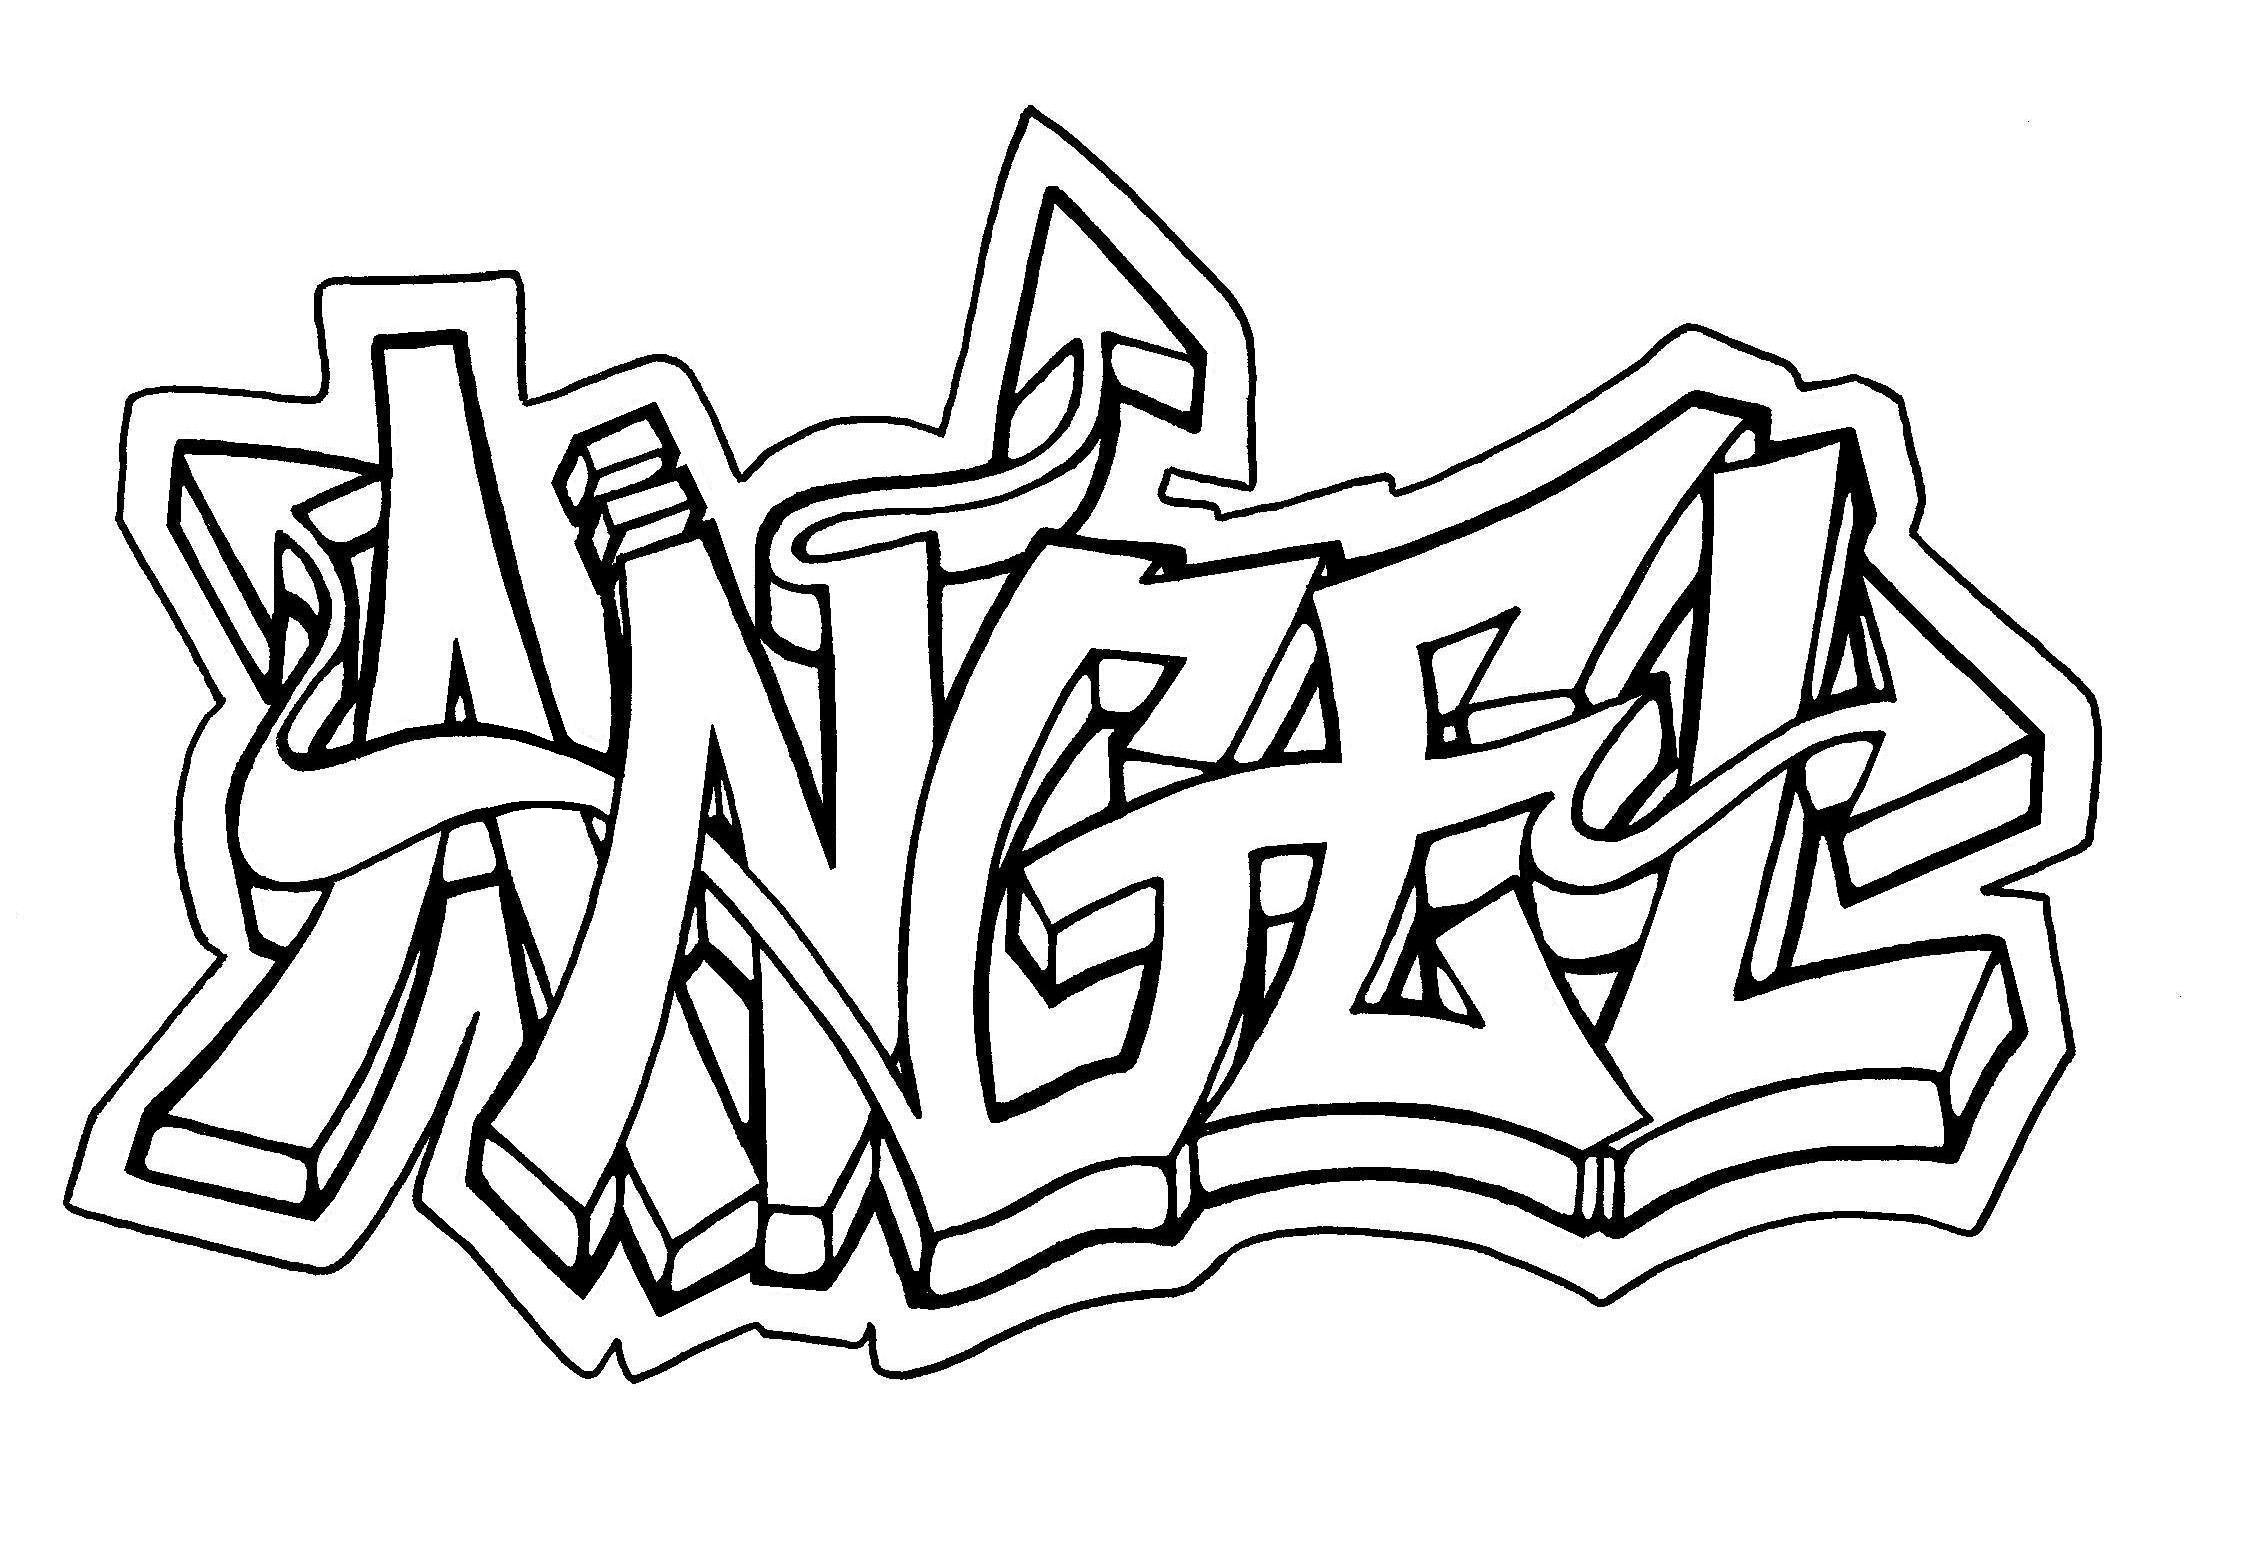 2247x1545 Graffiti Drawings And Outlines Best Graffiti Drawing